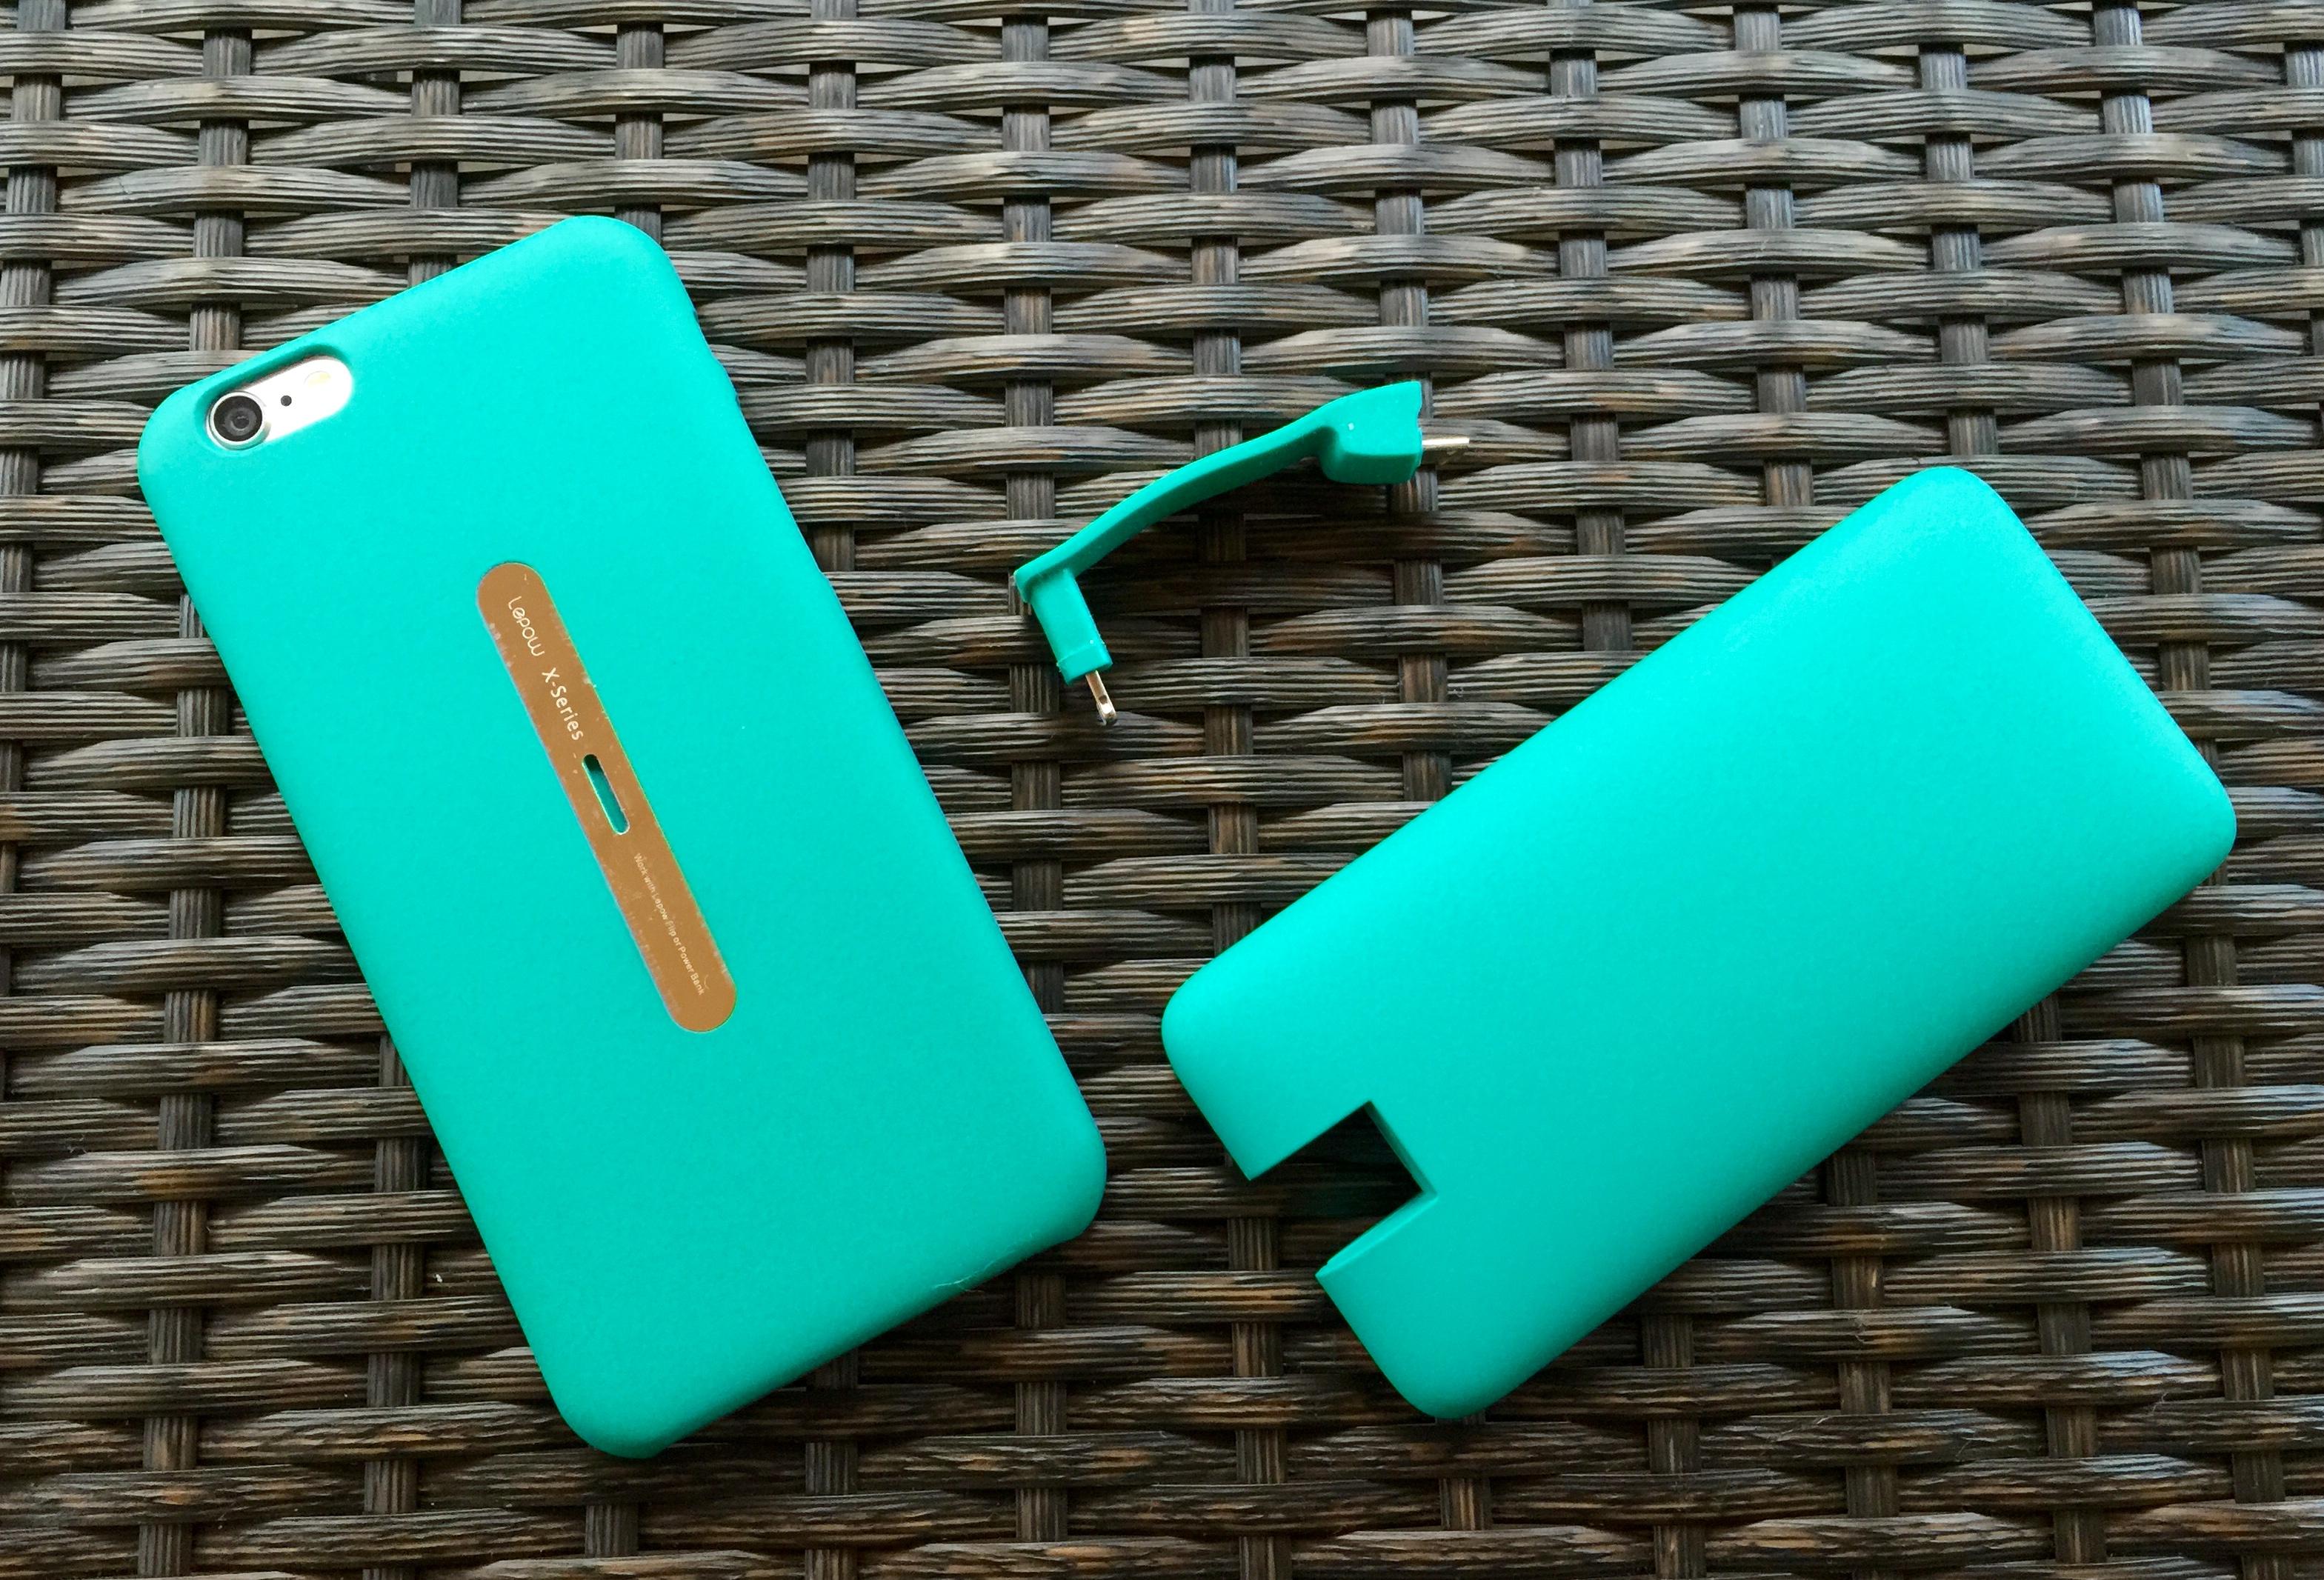 buy popular 3461b 1b8c6 Lepow Pie Review: iPhone 6 Battery Case